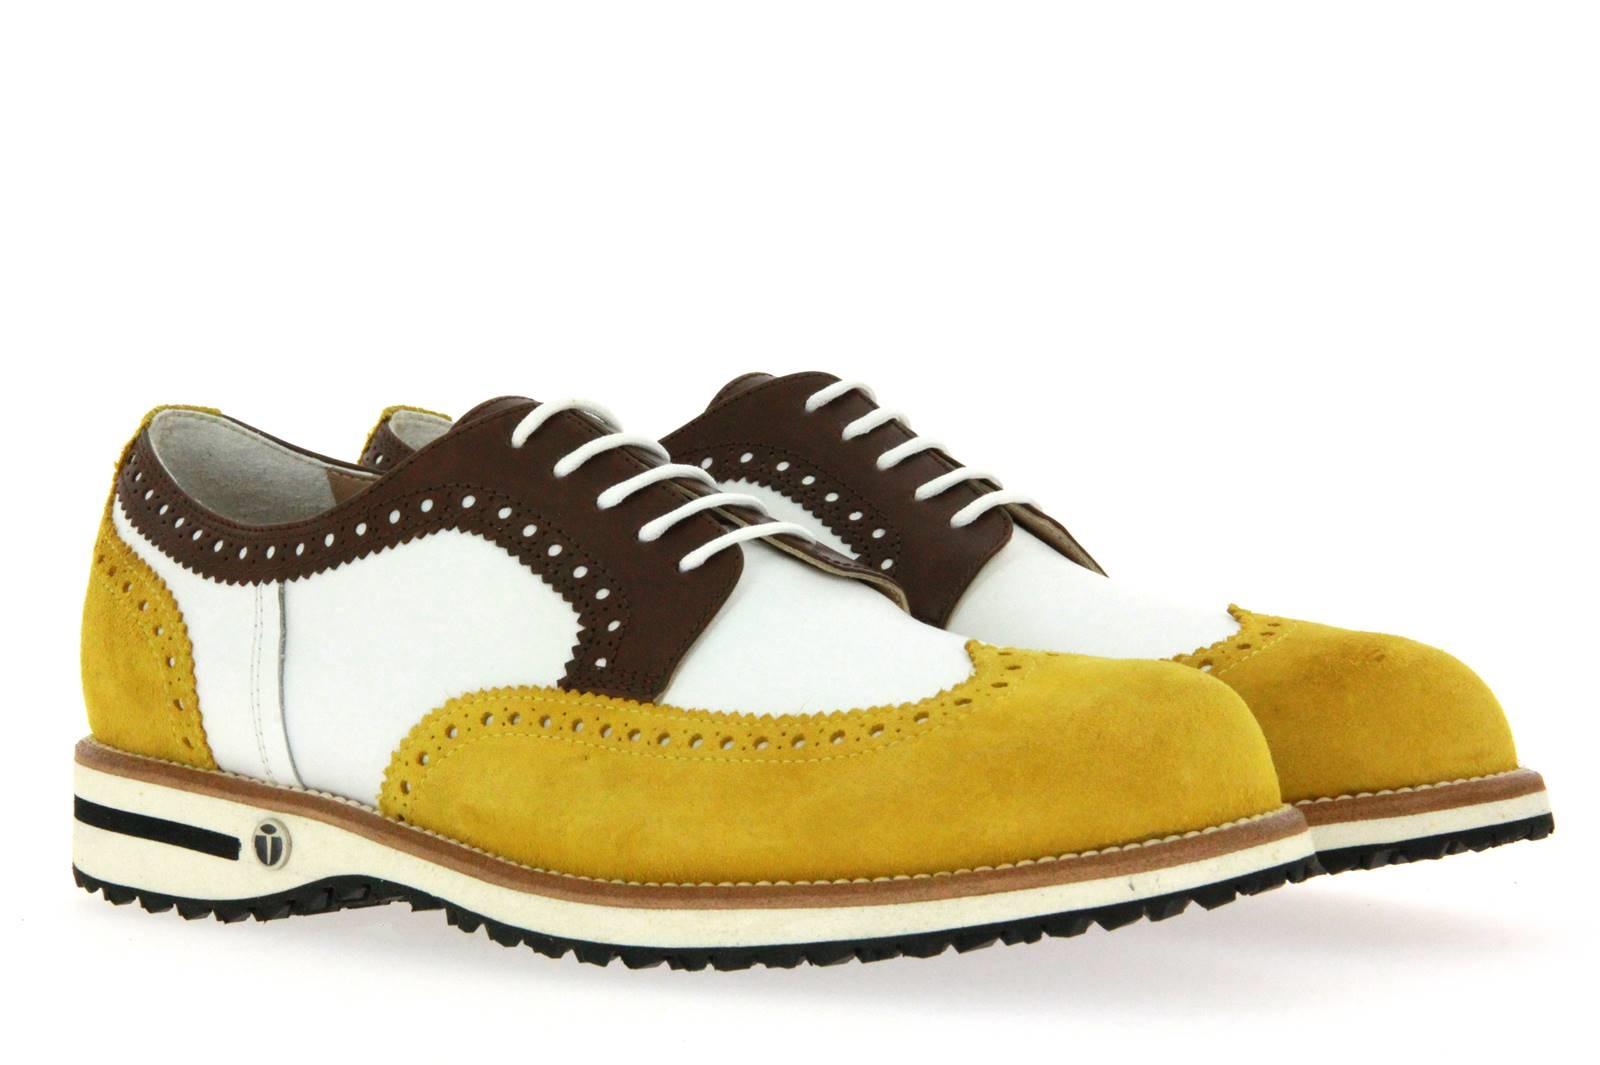 Tee Golf Shoes Herren- Golfschuh JASON SUN VITELLO WP BIANCO MORO (44)